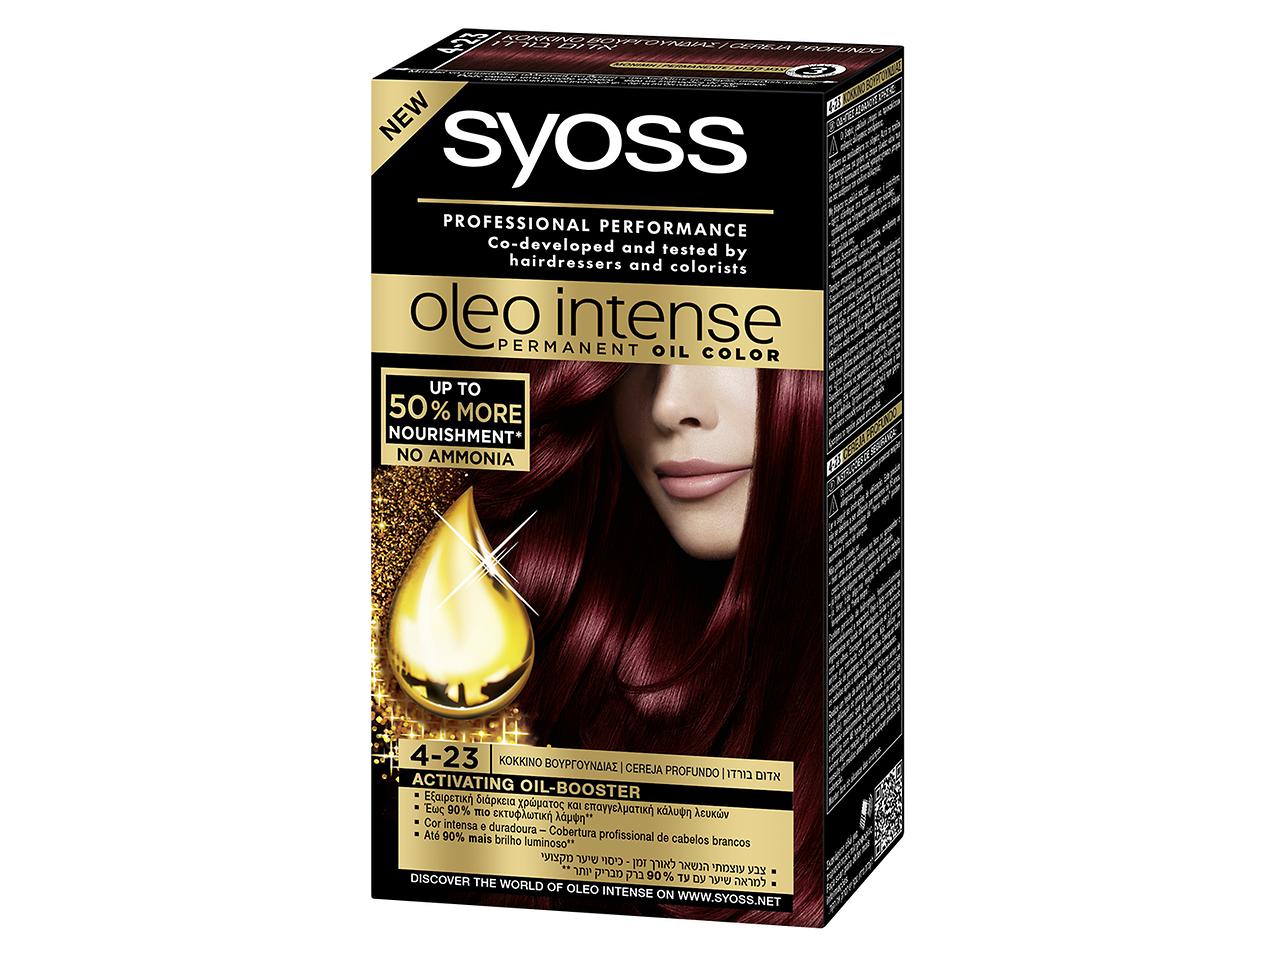 Syoss Oleo Intense 4-23 Cereja profundo